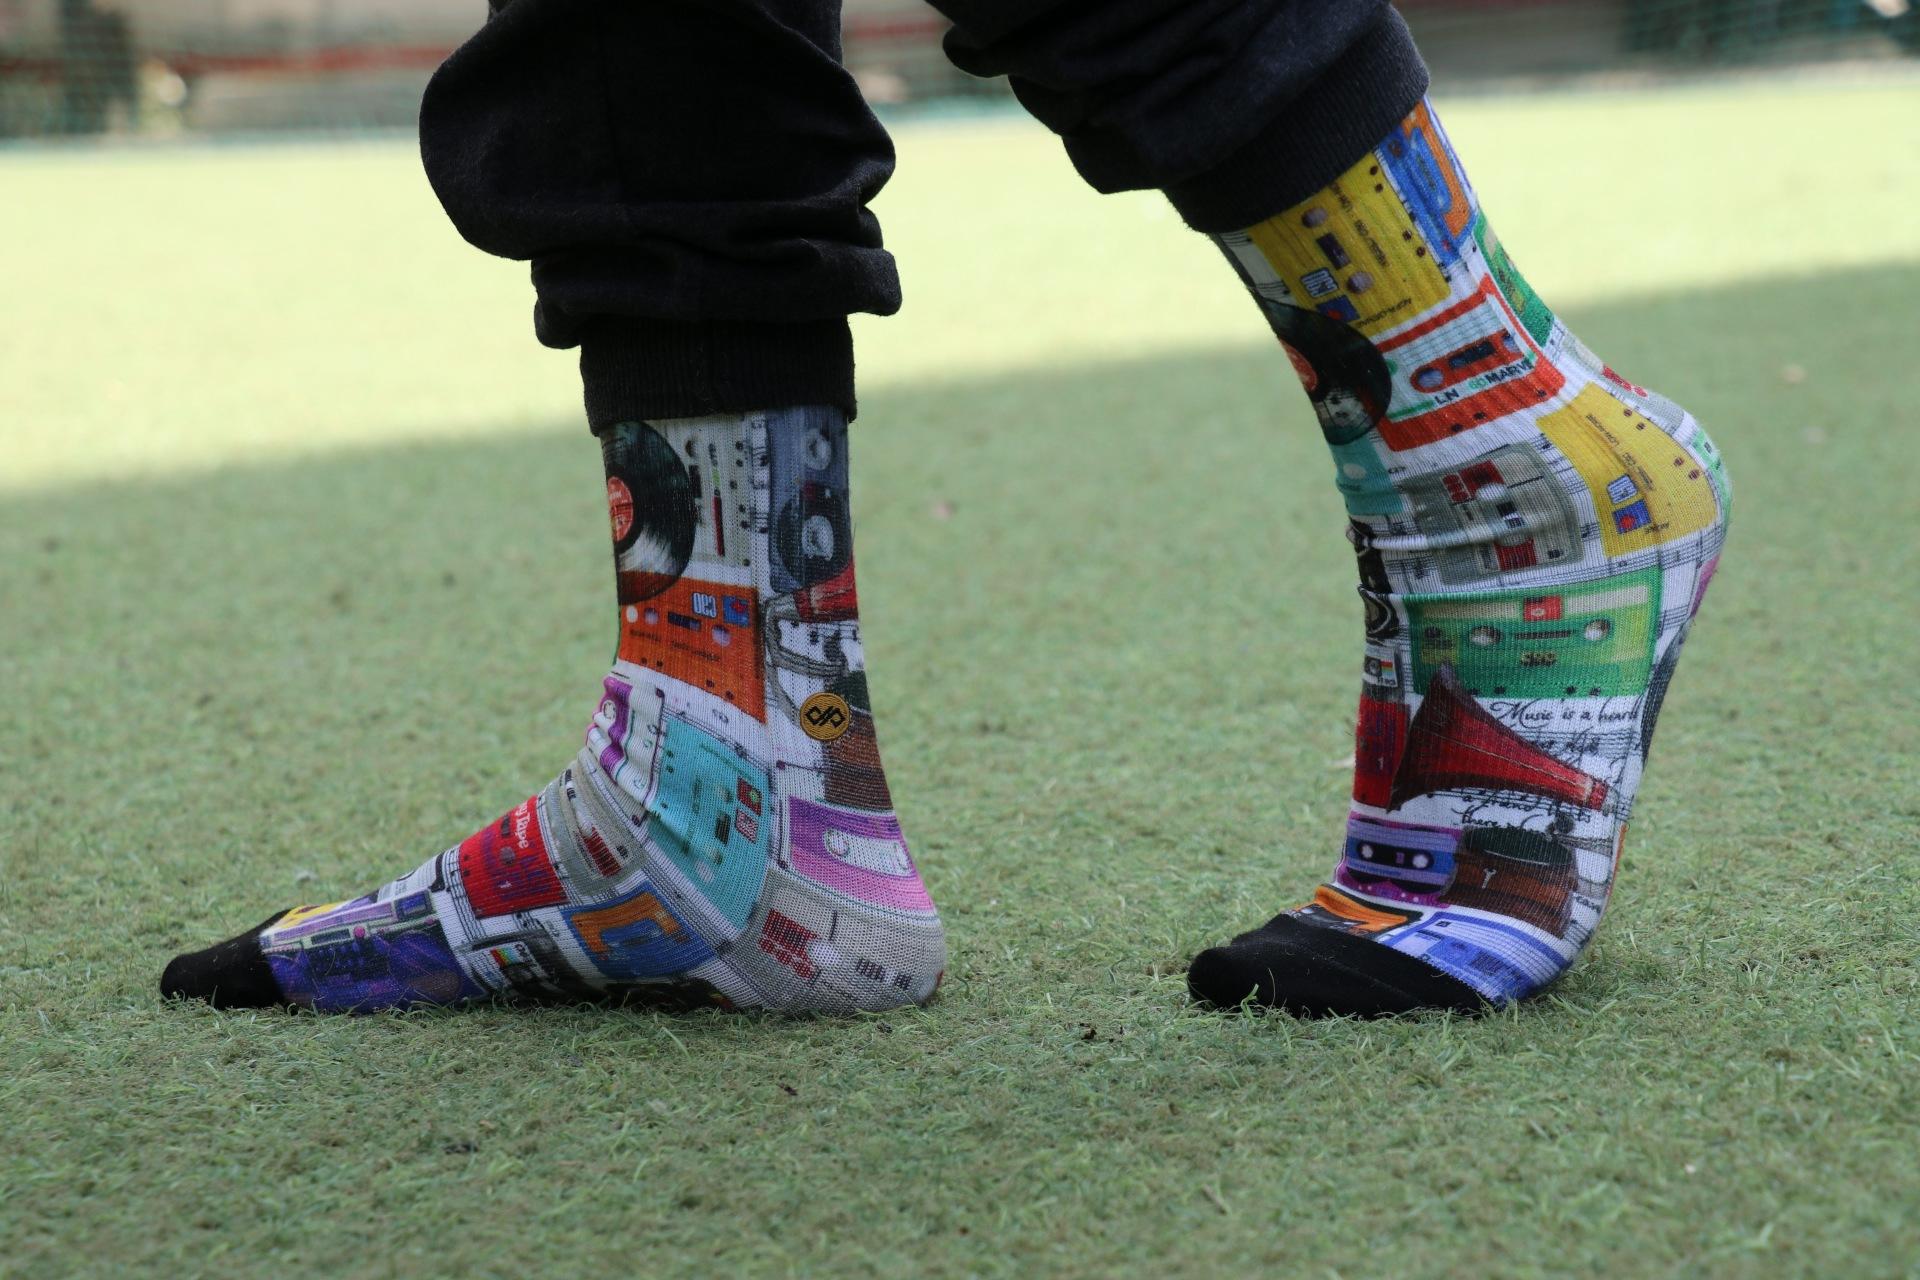 Dynamocks - Cassettes Socks